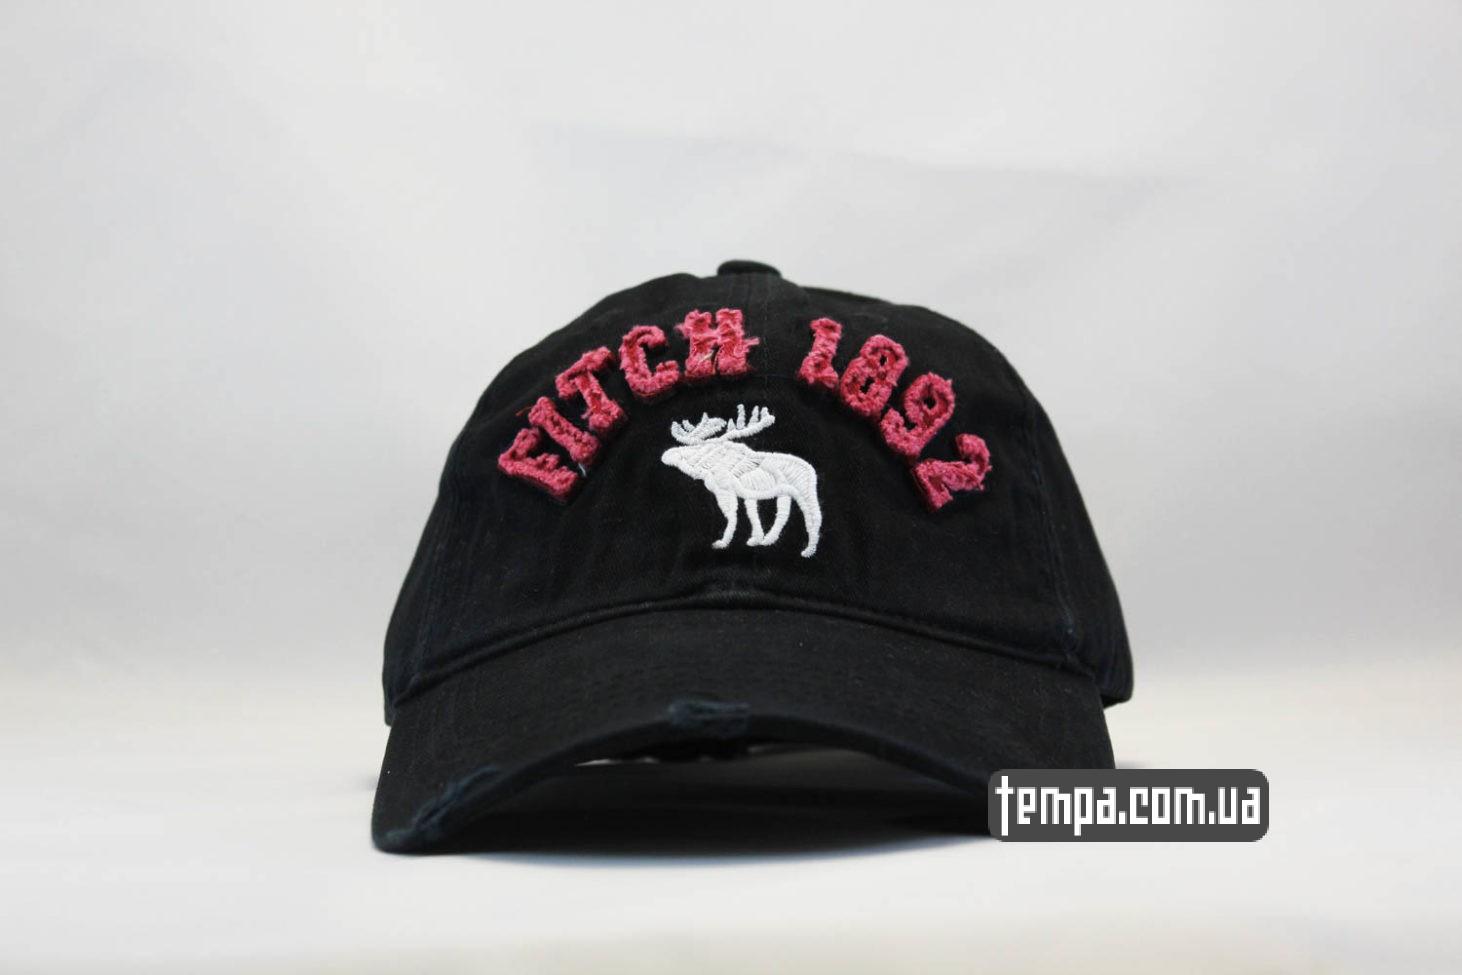 кепка бейсболка Abercrombie Fitch 1892 Holister черная